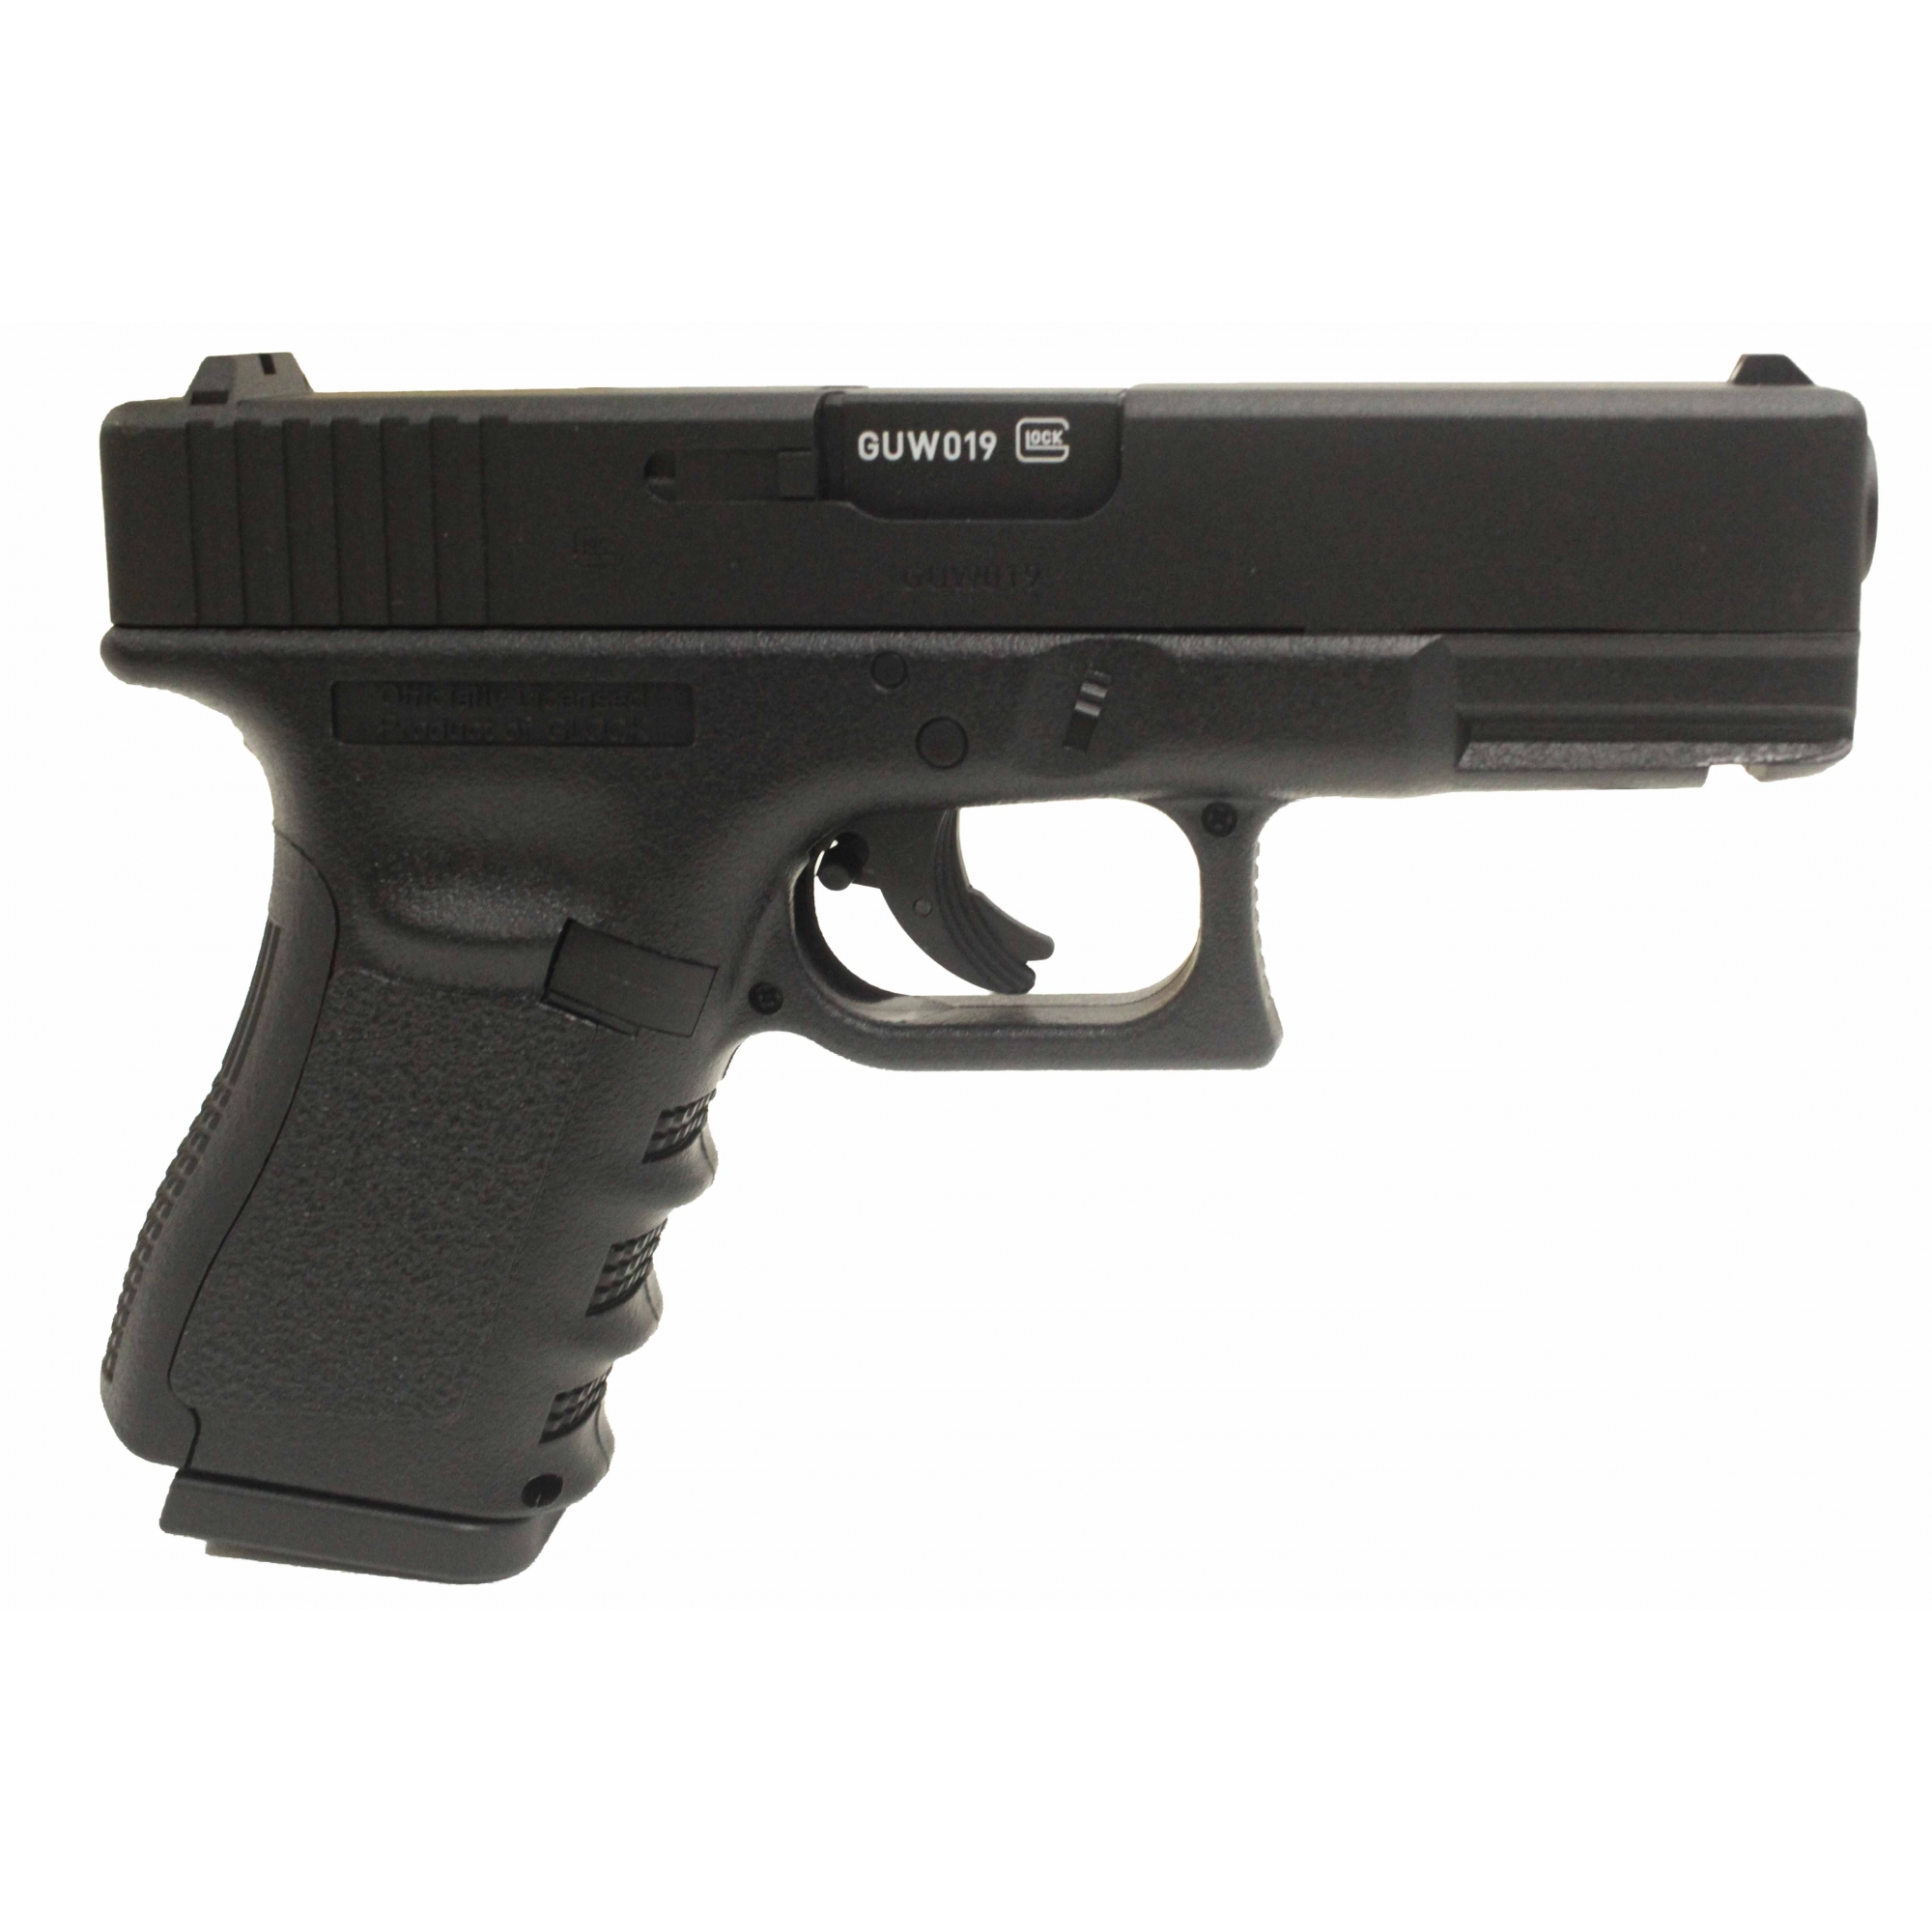 Pistola Glock G19 Umarex Co2 4.5mm